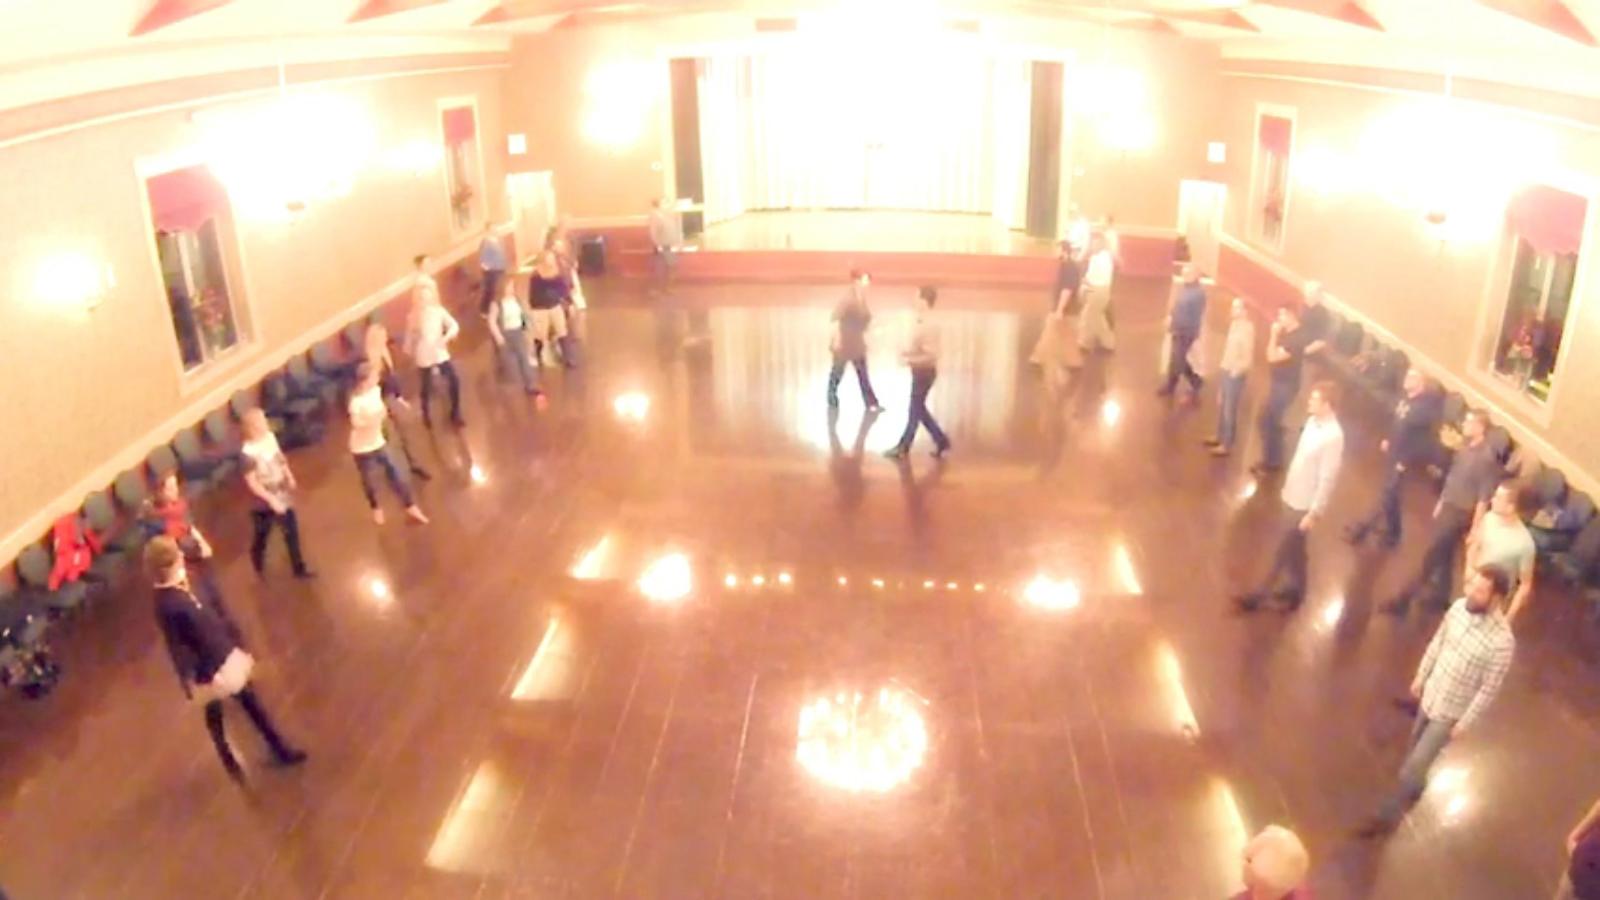 20151113 – Absolute Beginners Ballroom Session 08 (Rumba/Tango)